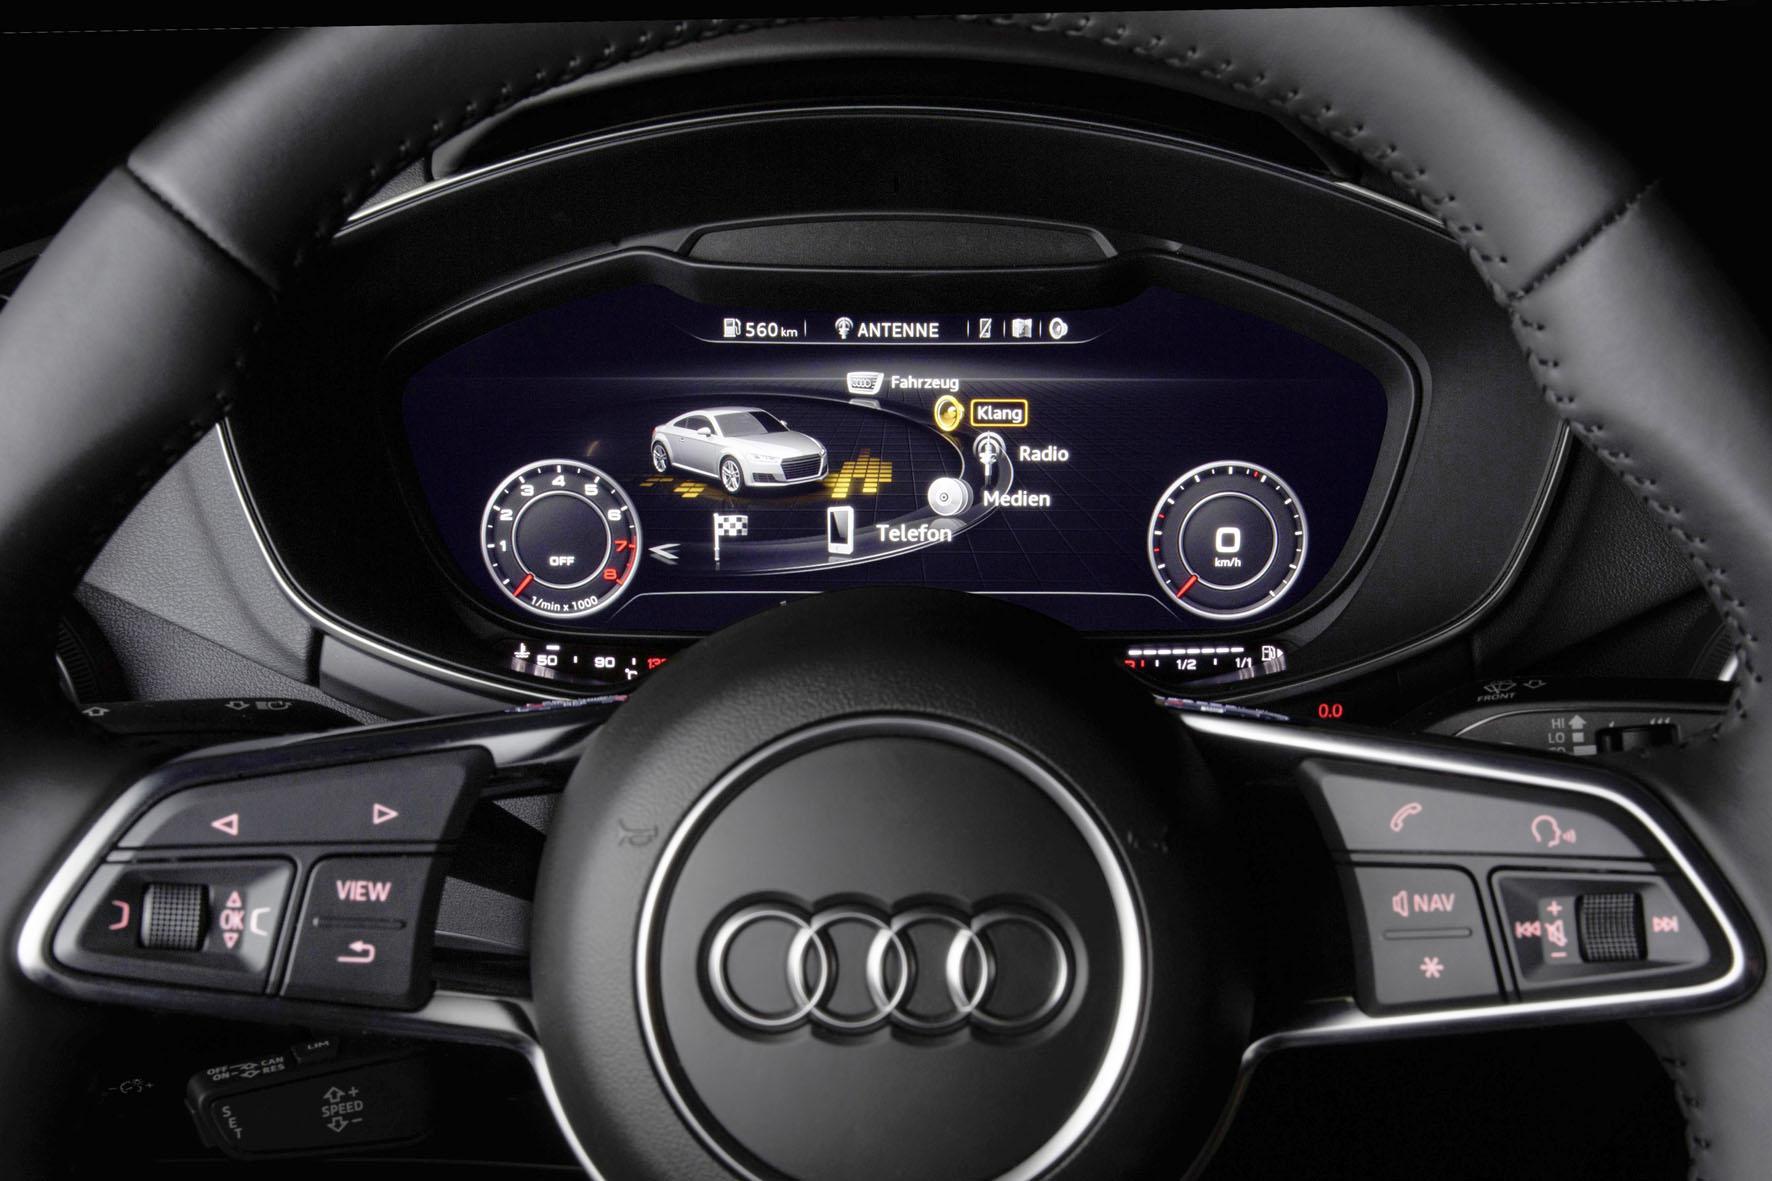 Bang & Olufsen Sound System mi Symphoria im Audi TT